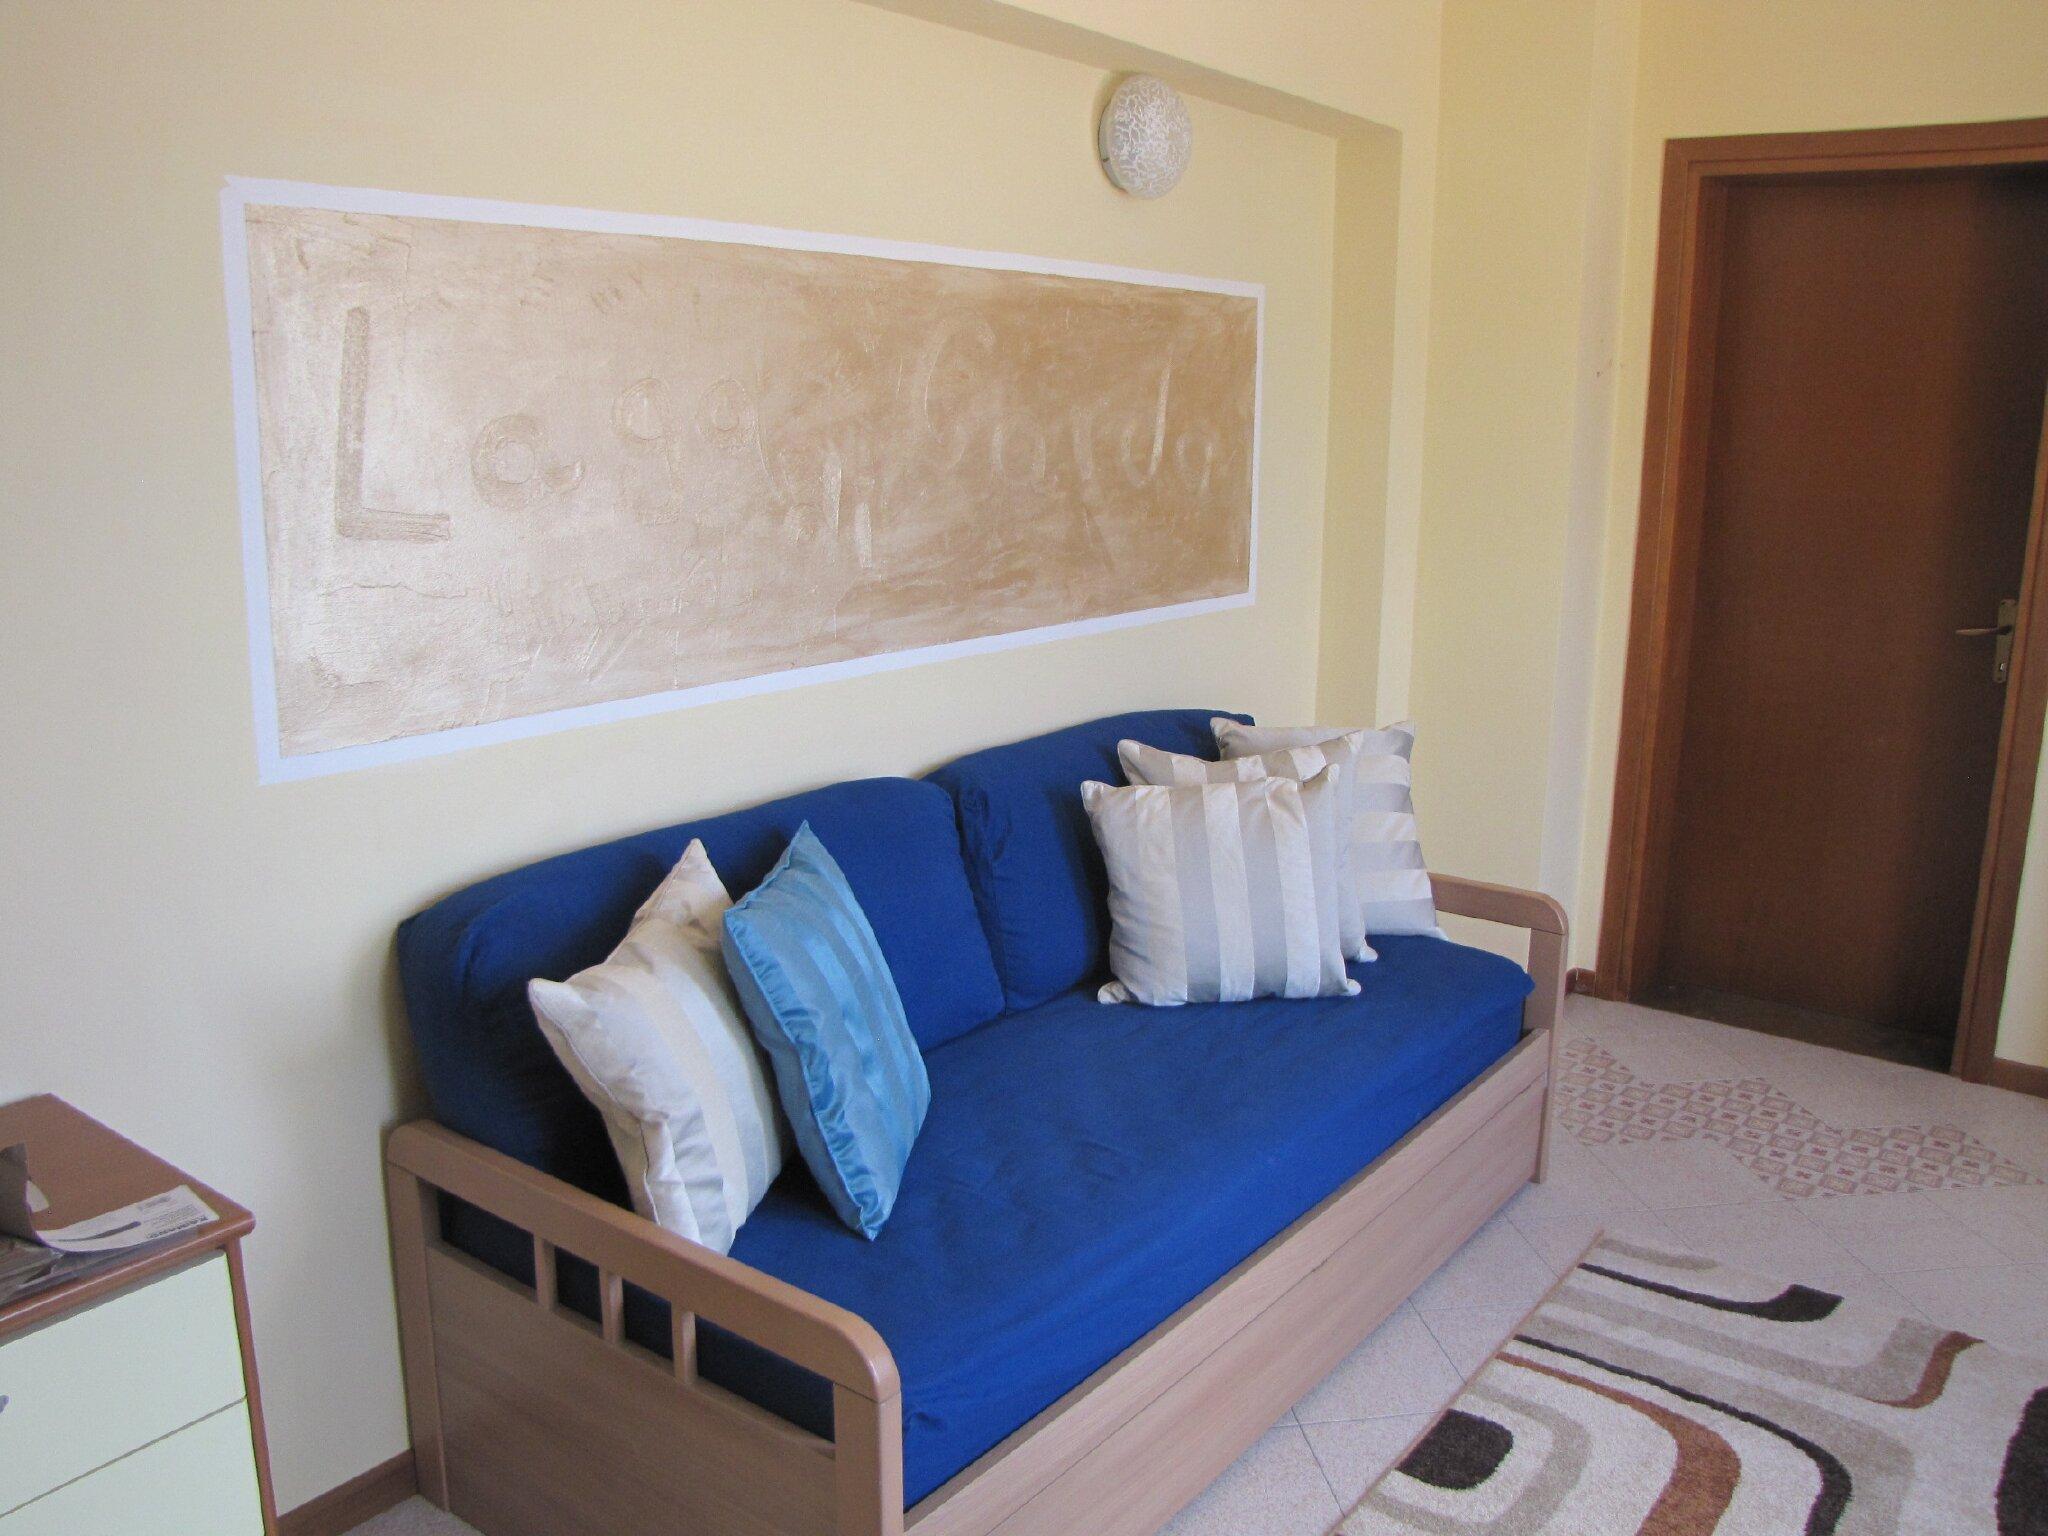 Zusatzbild Nr. 05 von Villa Casa Alkea